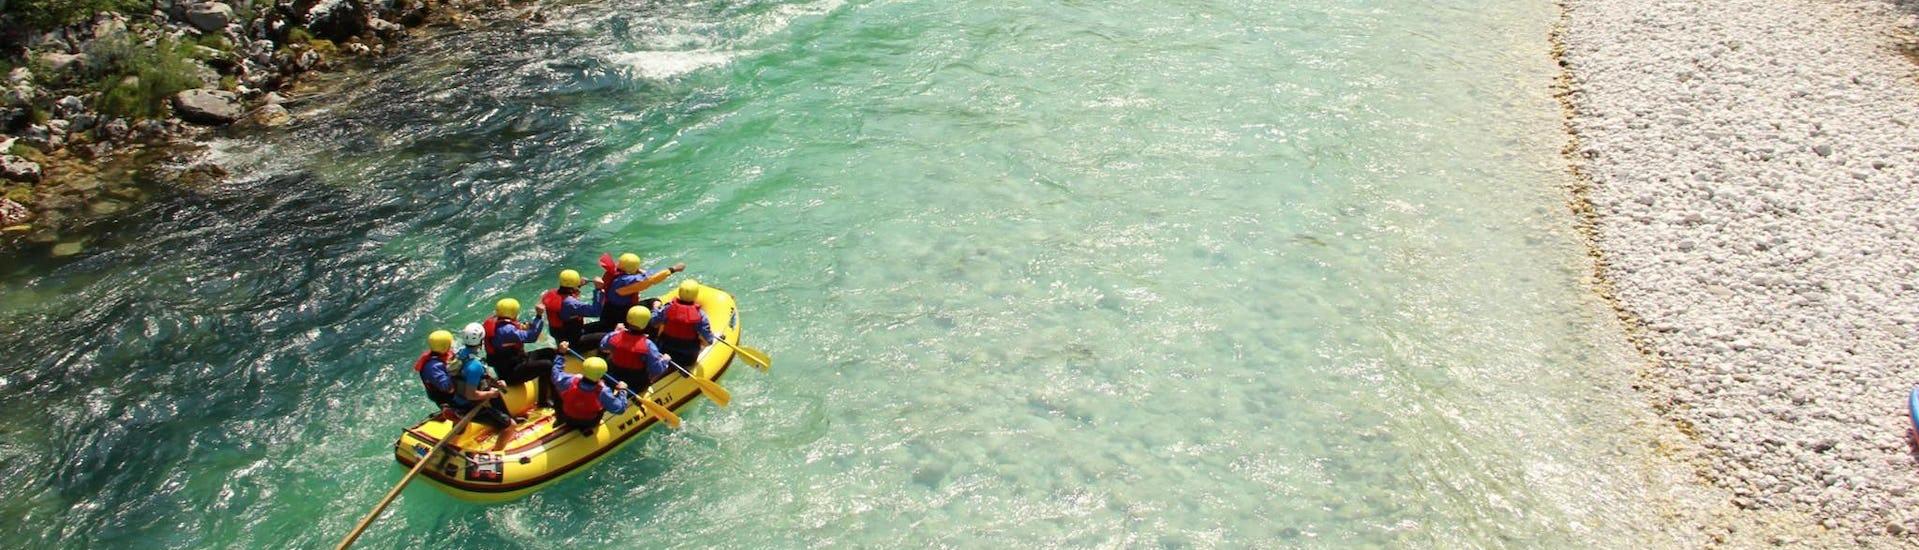 rafting-on-the-soca-river-standard-tour-top-rafting-hero